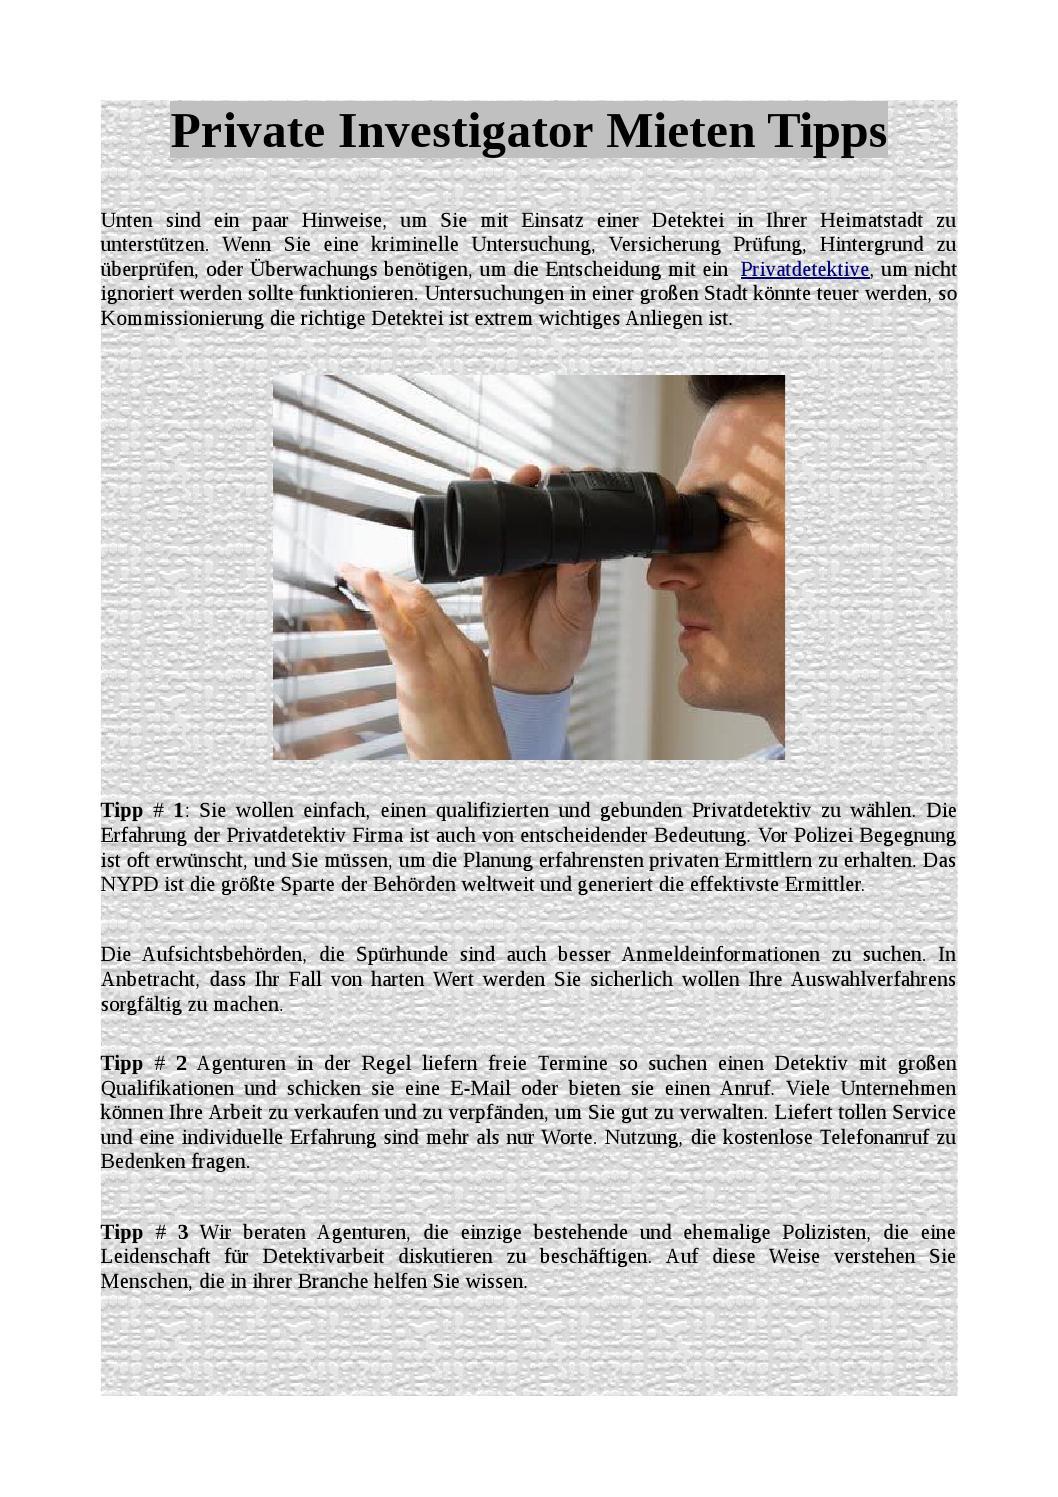 private investigator mieten tipps by adwardjoseph issuu. Black Bedroom Furniture Sets. Home Design Ideas